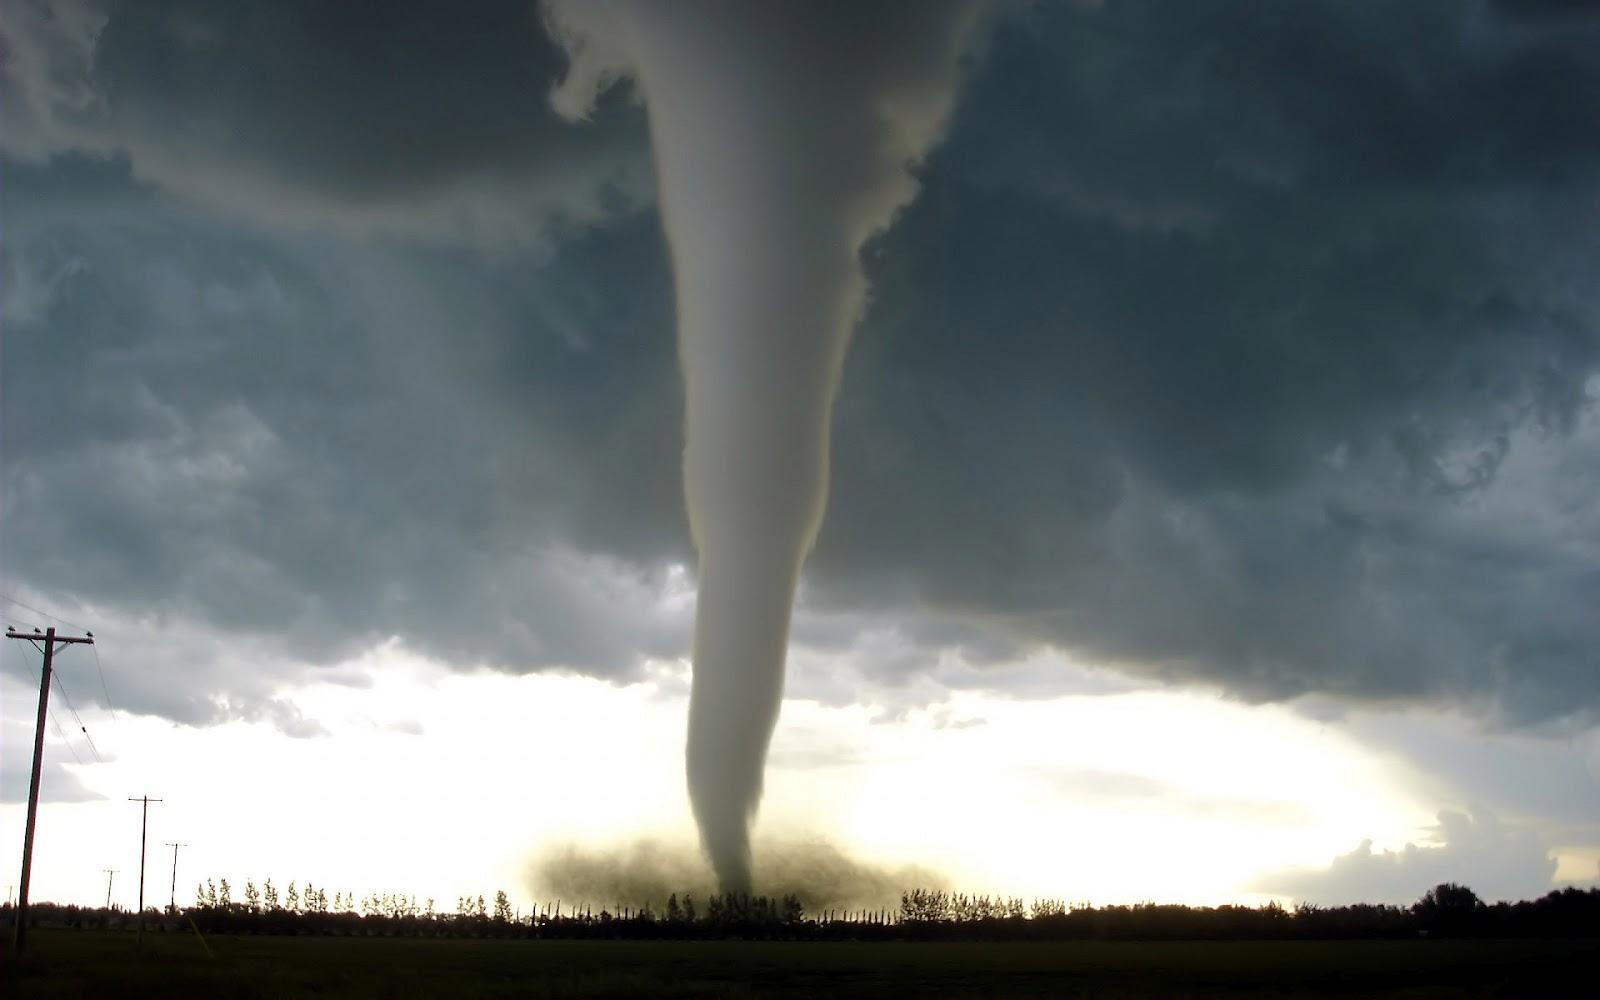 Mooie tornado achtergronden hd tornado wallpapers foto 11jpg 1600x1000